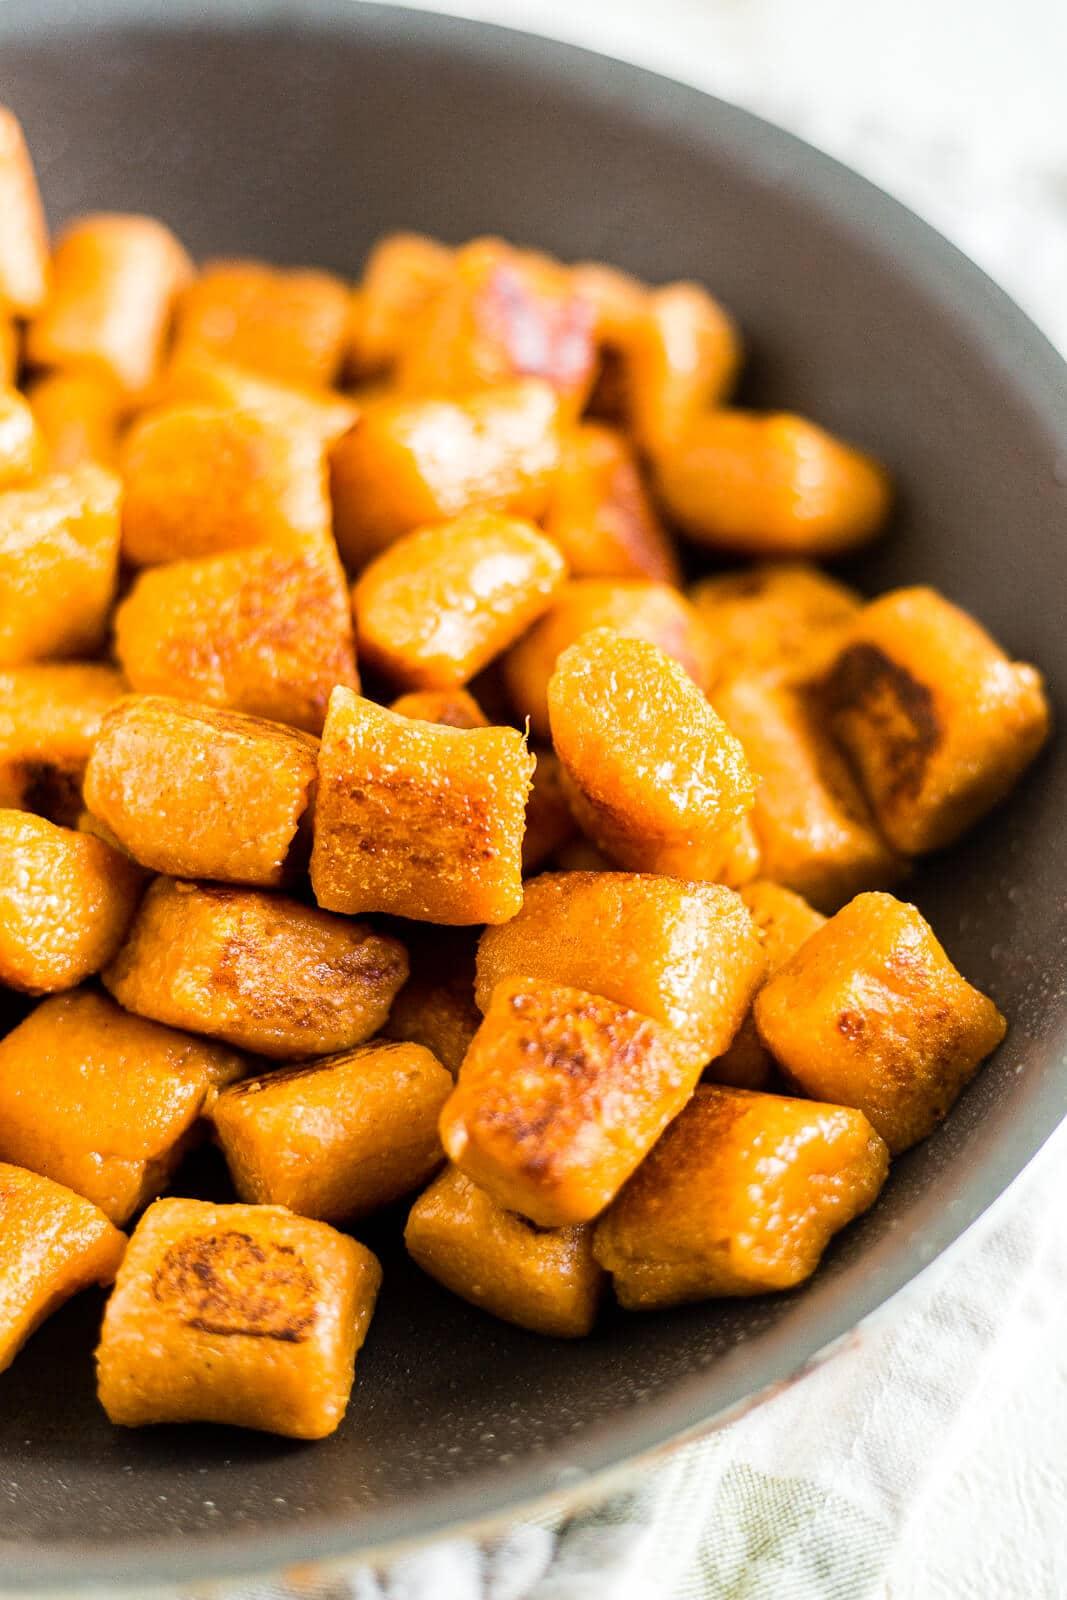 boiled and seared sweet potato gnocchi recipe in a black saute pan